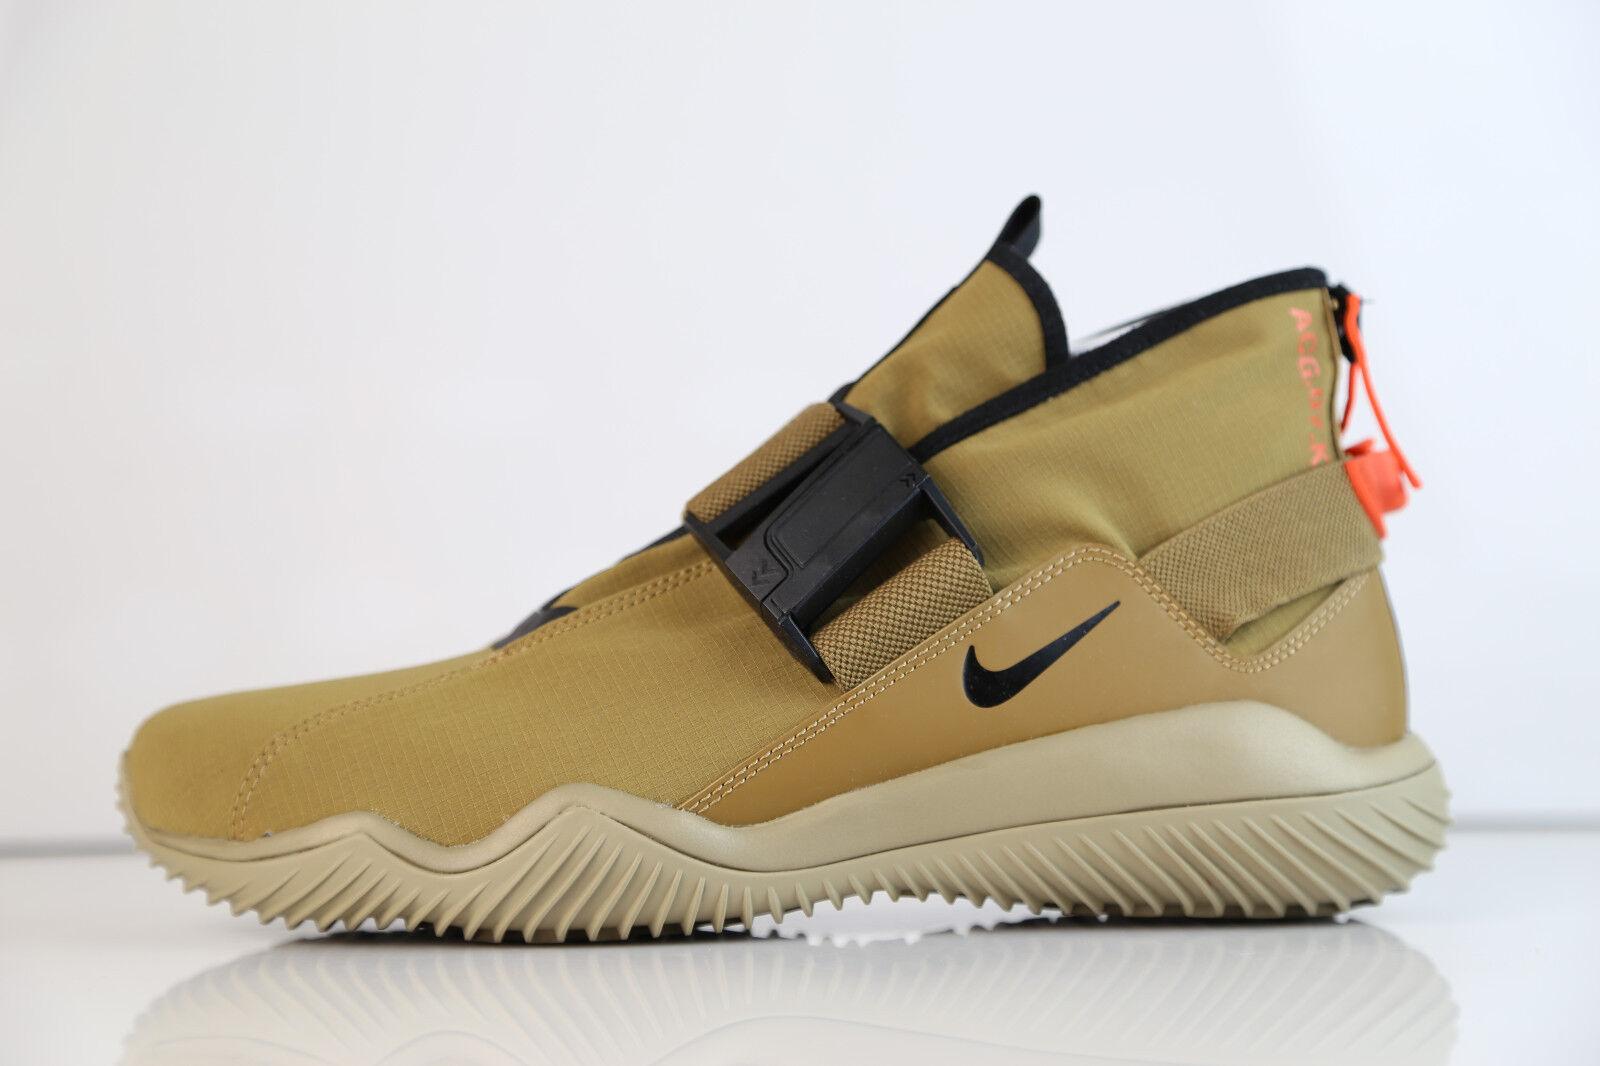 Nike Lab ACG 07 KMTR Komuyter Golden Beige noir Khaki 902776-2018 8-13 free air